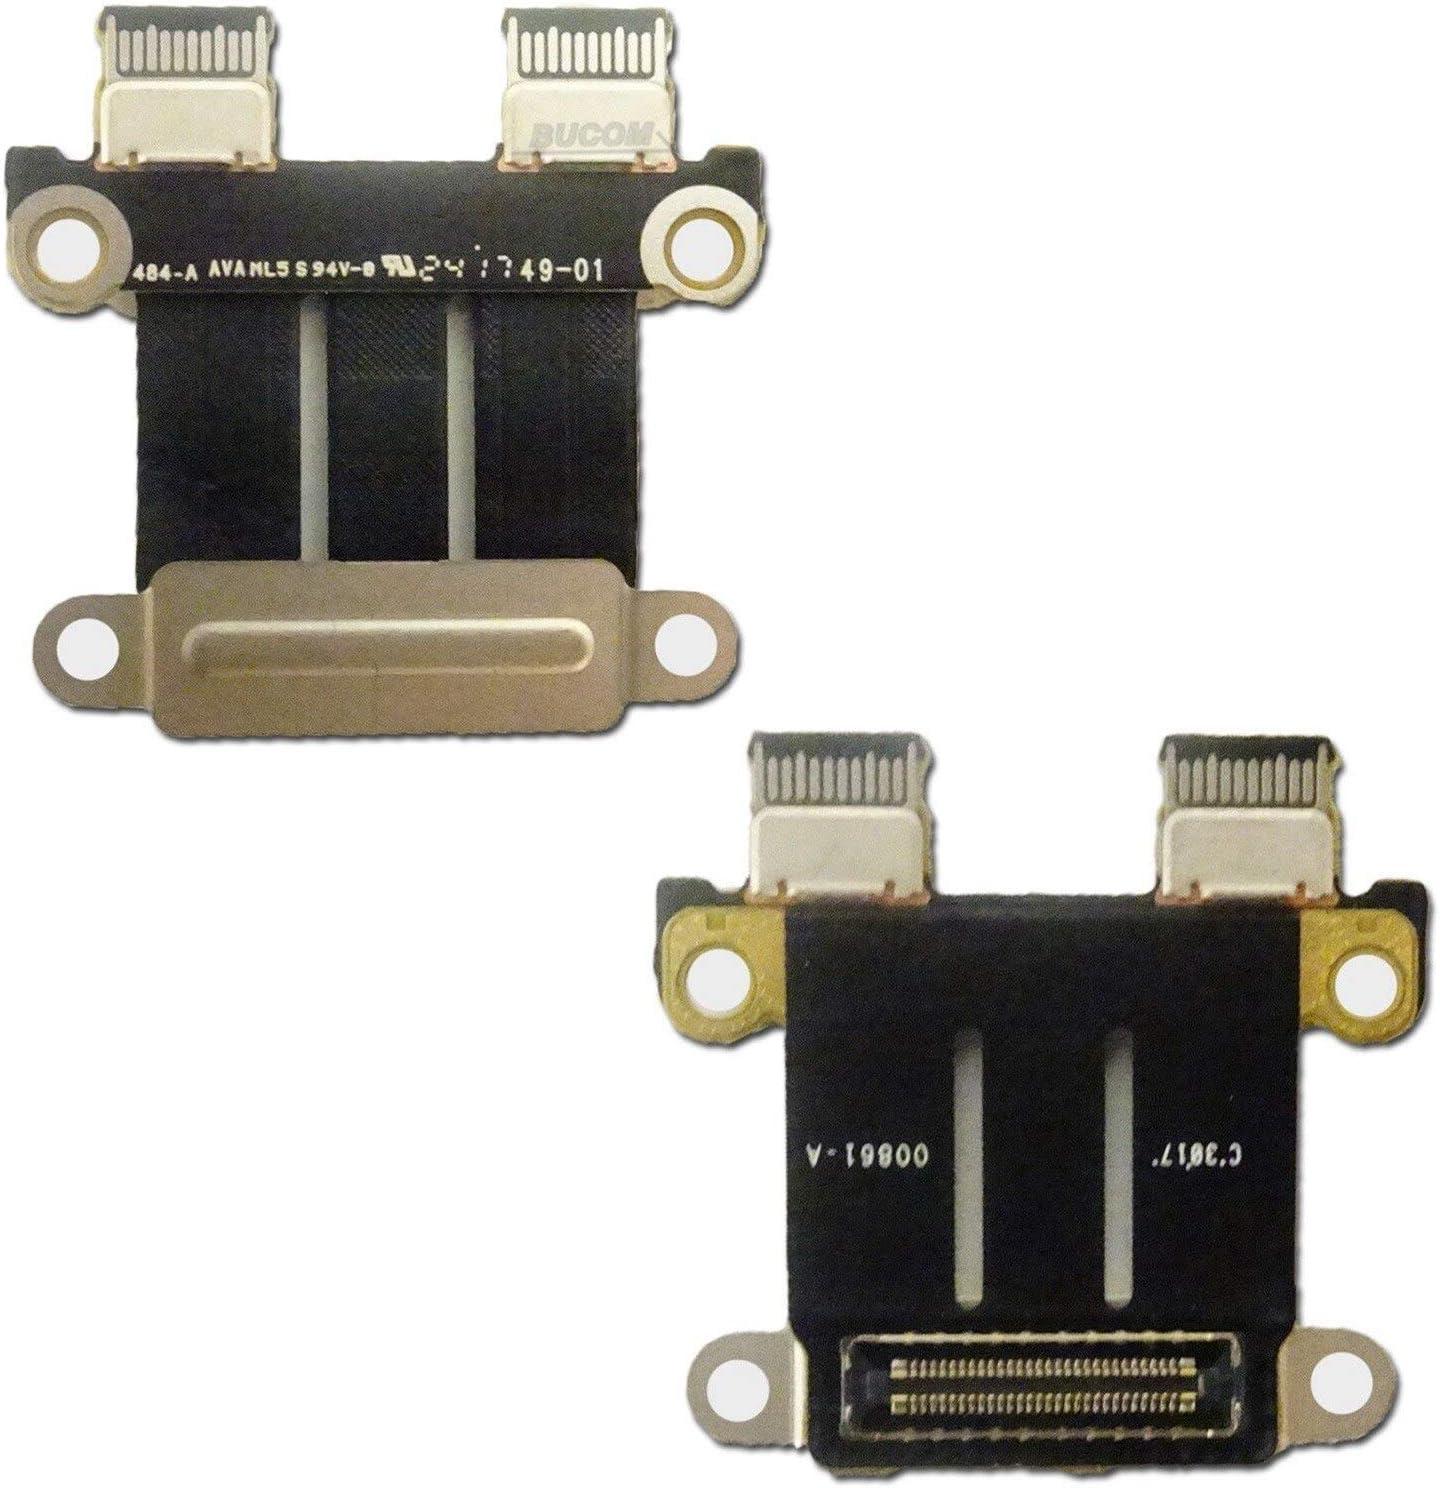 DC Power Jack I//O Board For Macbook Pro 13 Inch 15 Inch A1706 A1707 A1708 820-00484-02 Kul-Kul